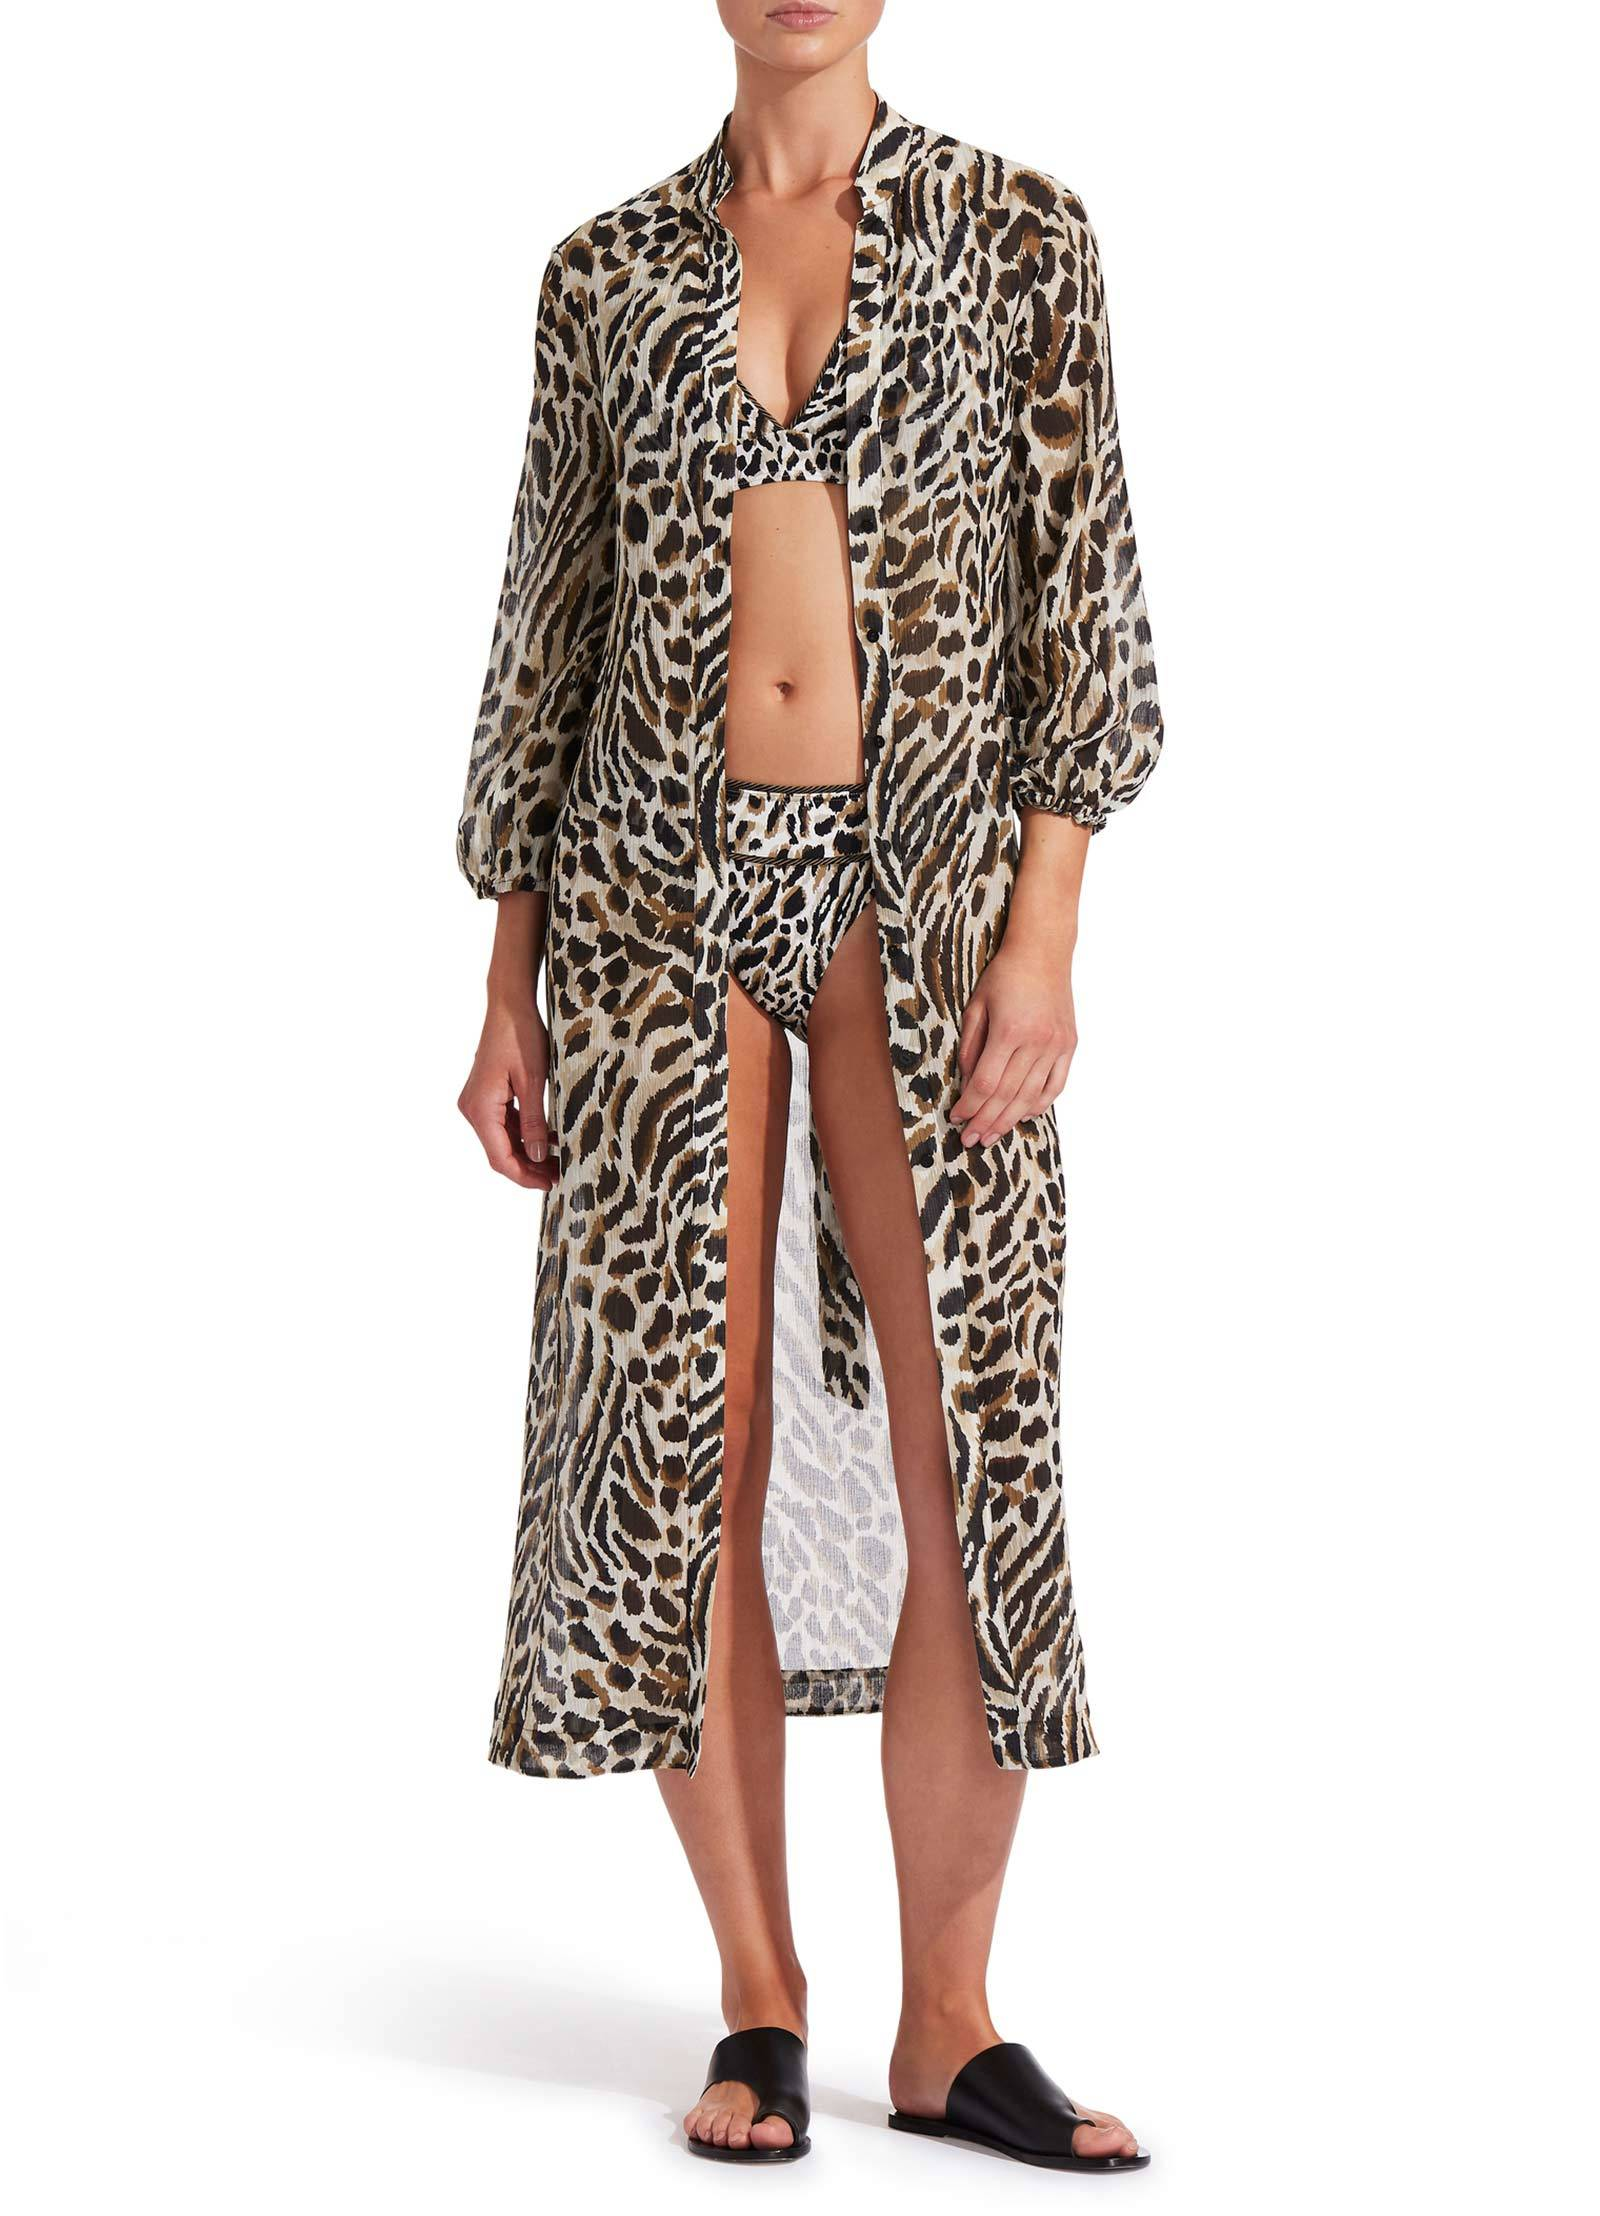 Jets Prowess Maxi Dress, Leopard